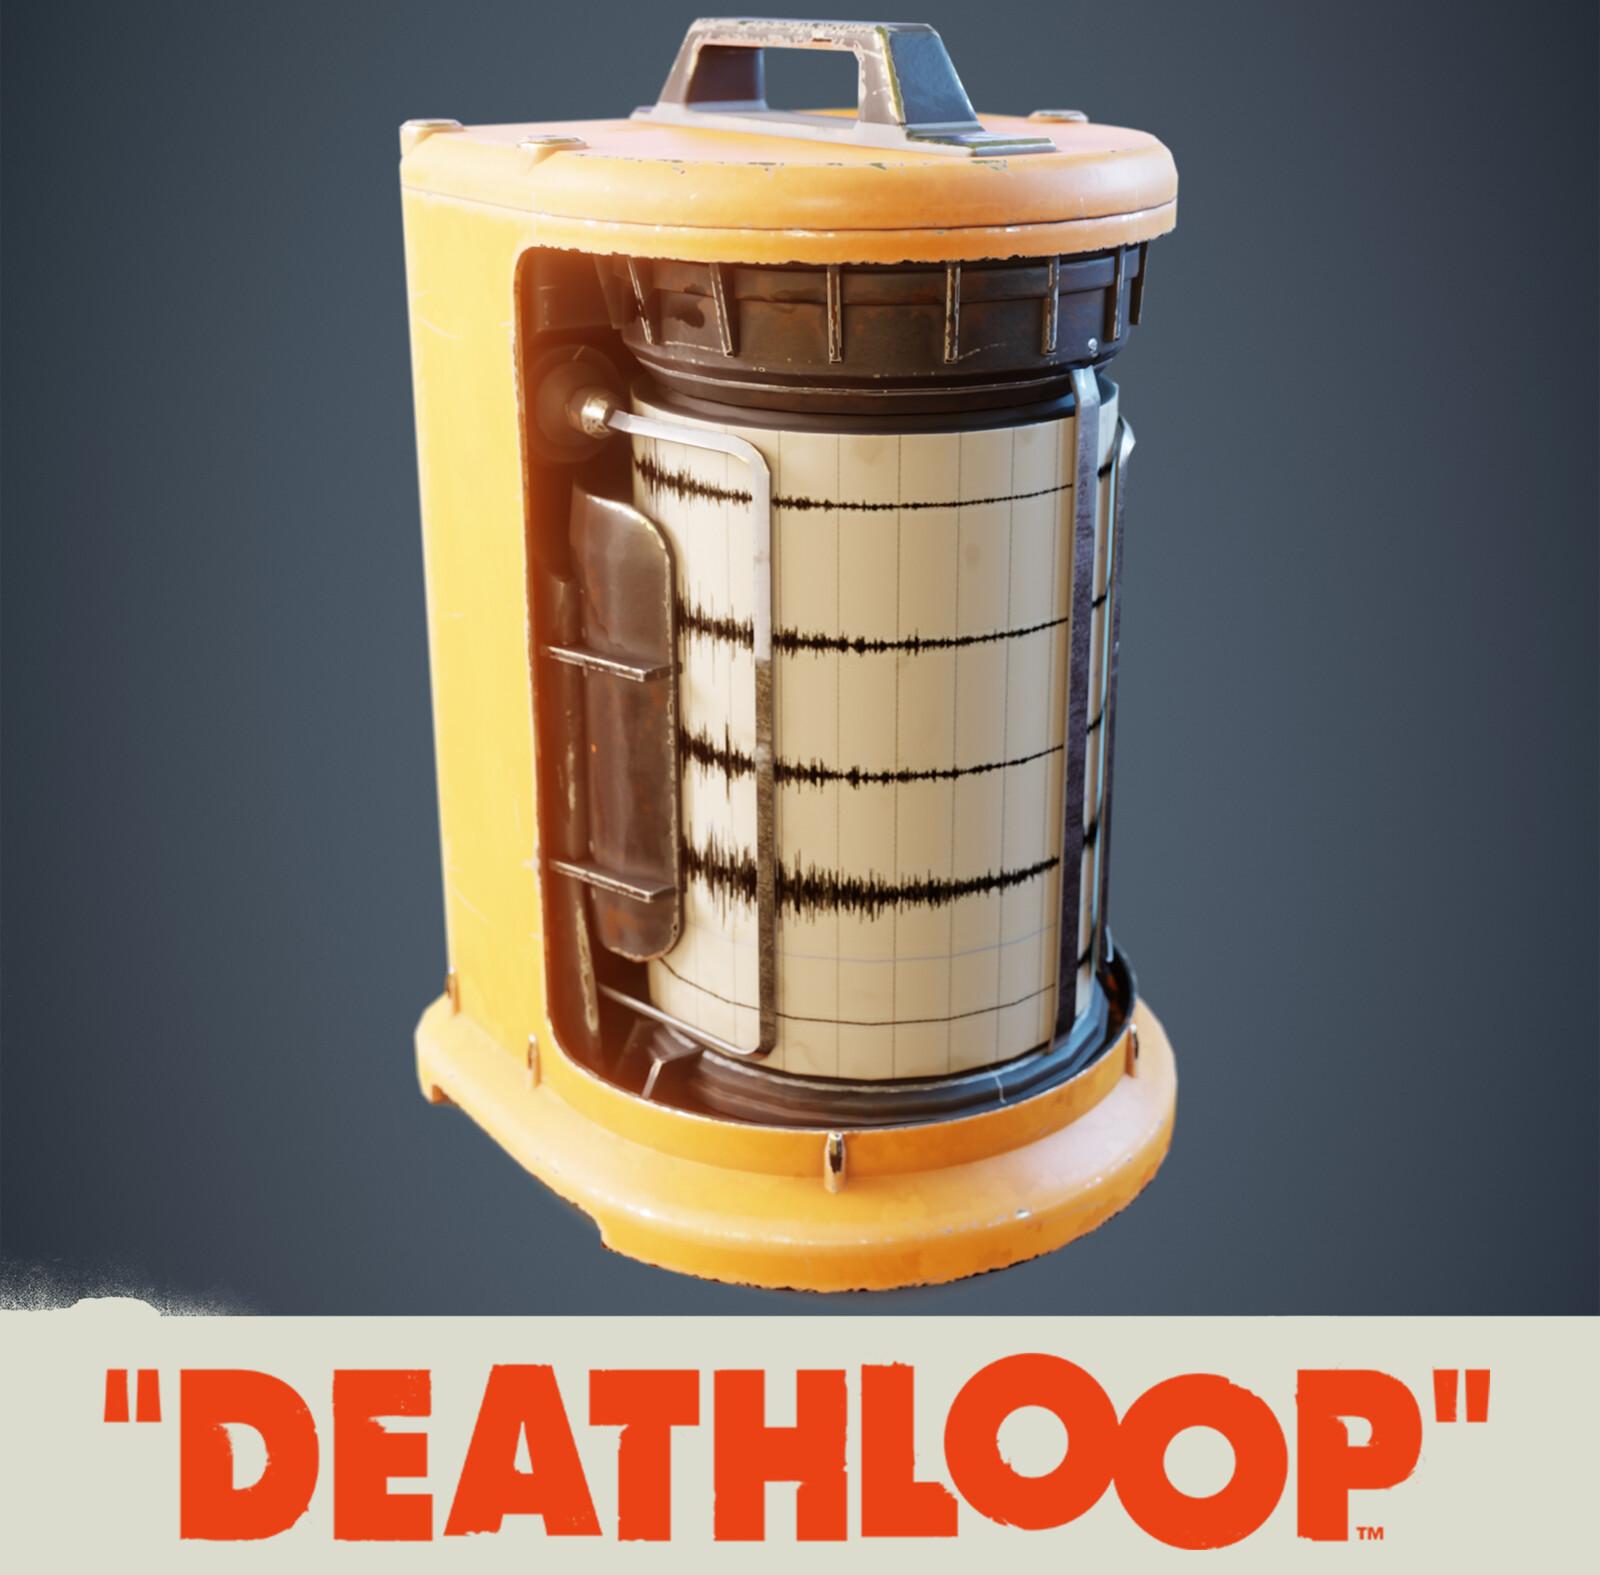 Seismometer: Deathloop Prop